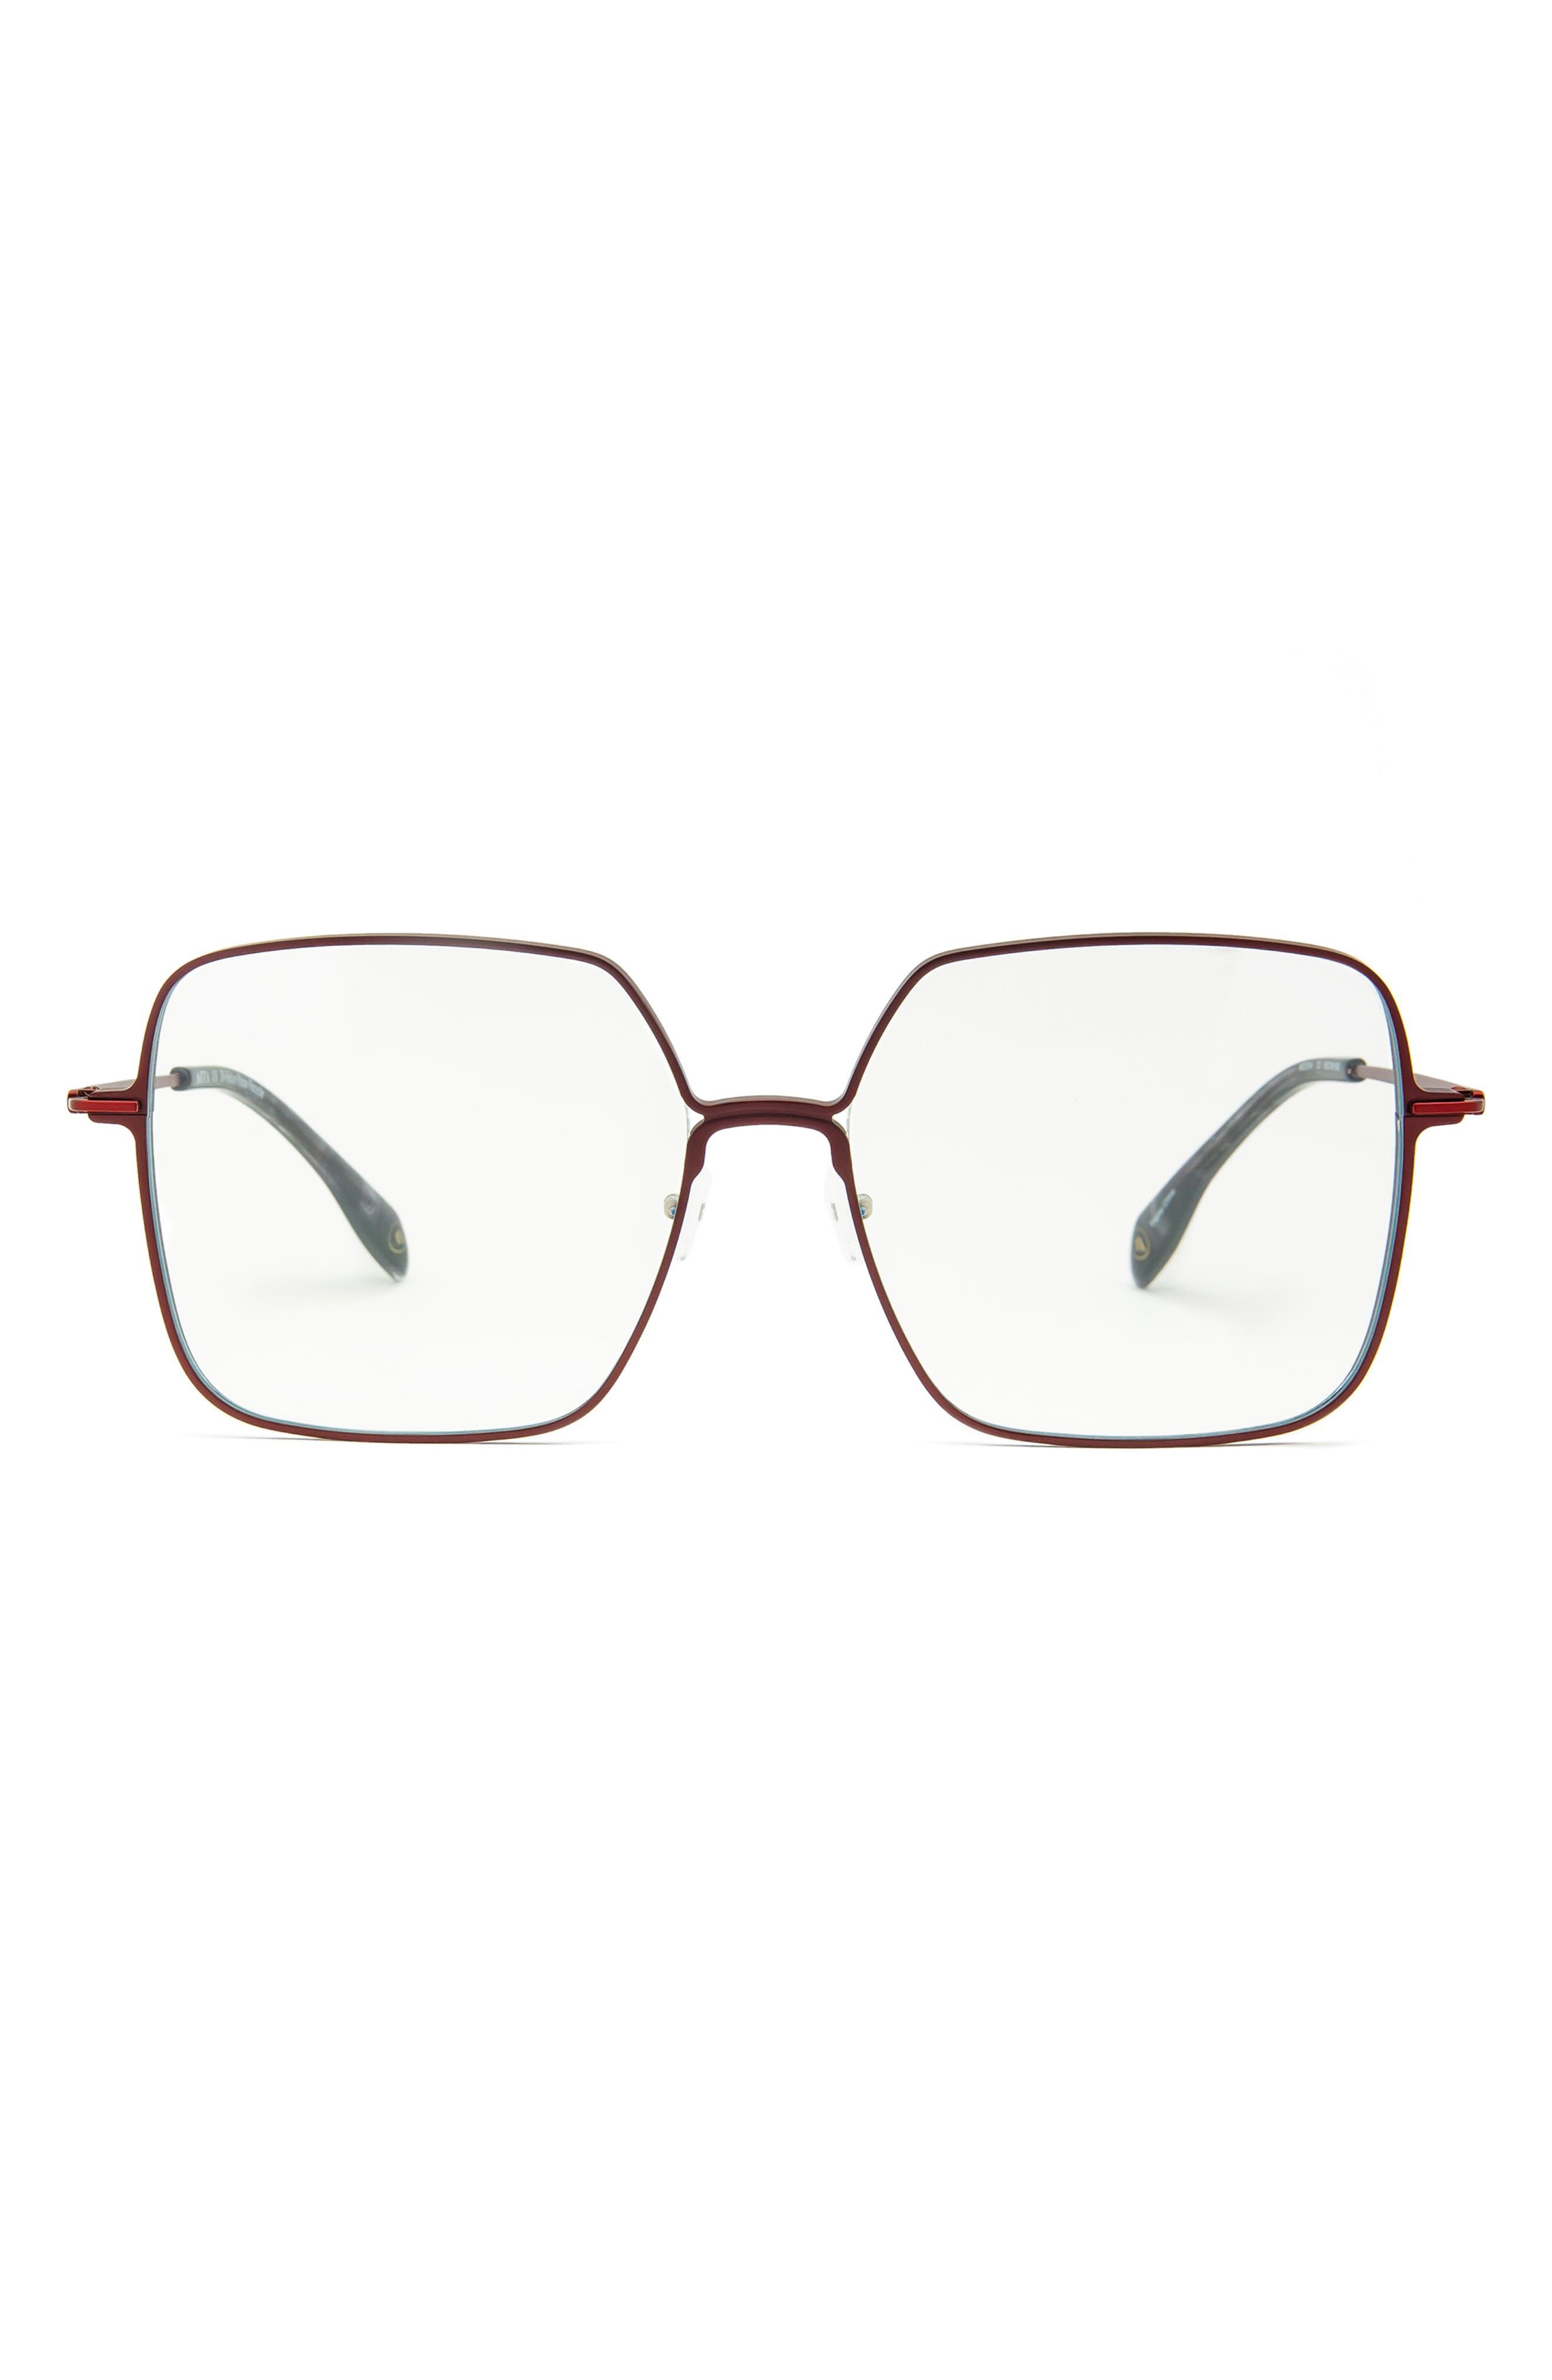 59mm Square Blue Light Blocking Glasses